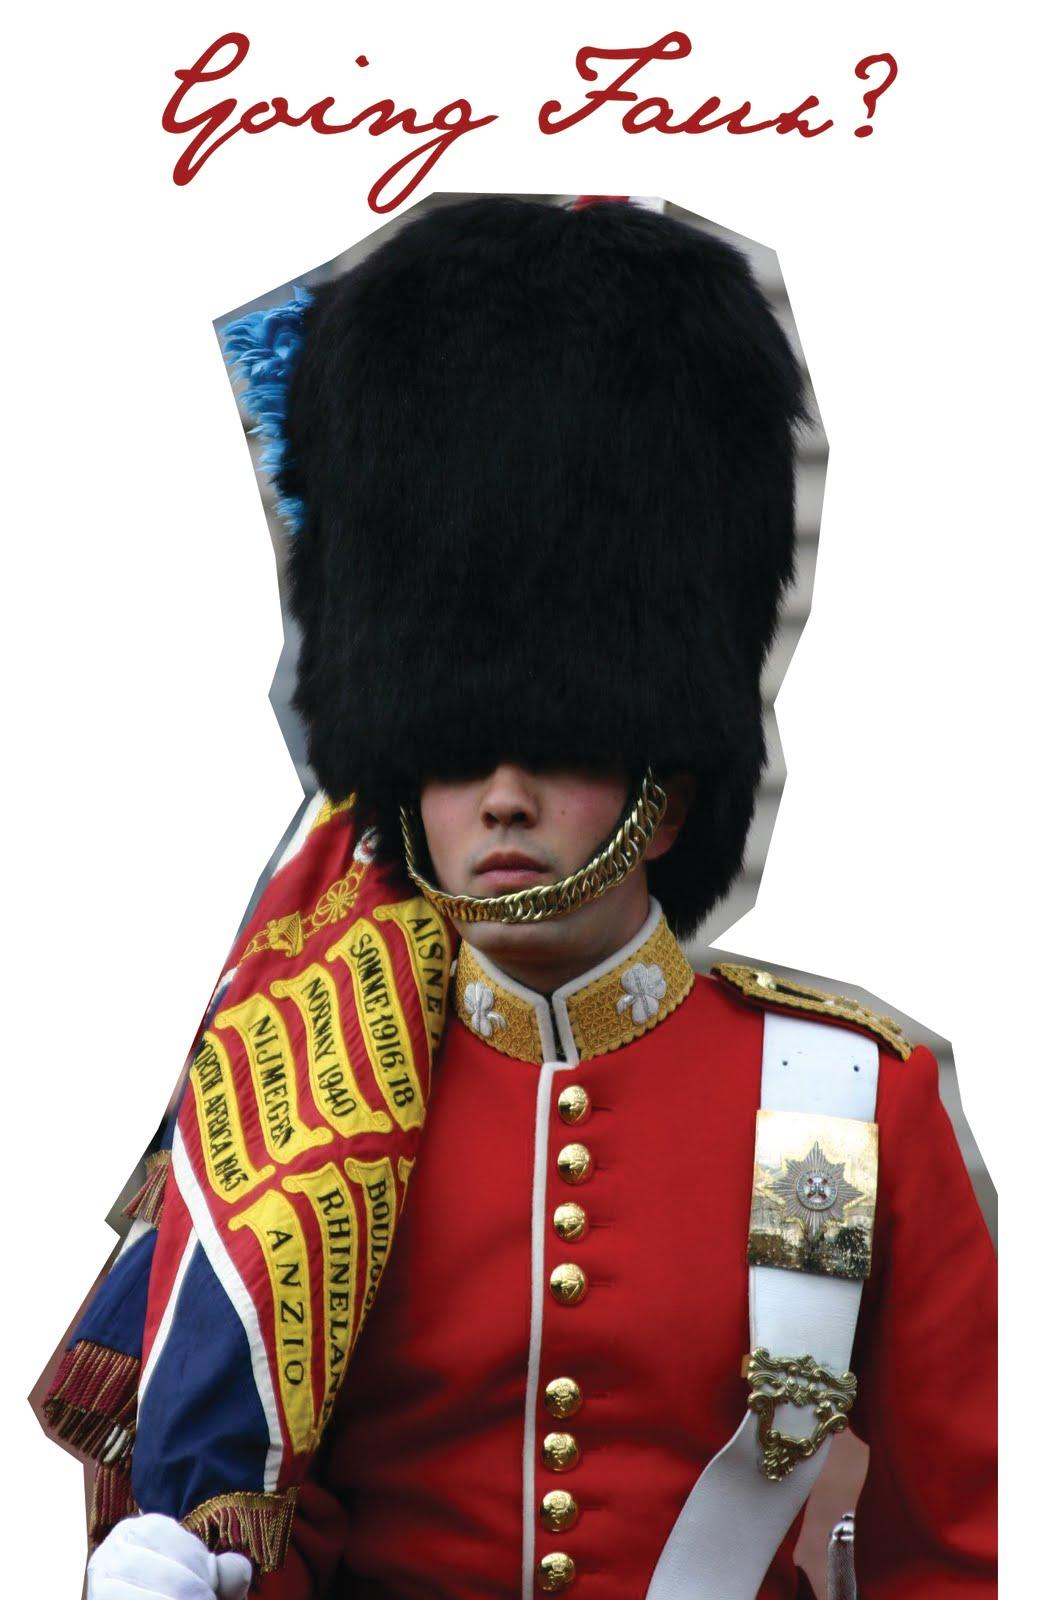 stella mccartney designing faux fur hats for guards at buckingham